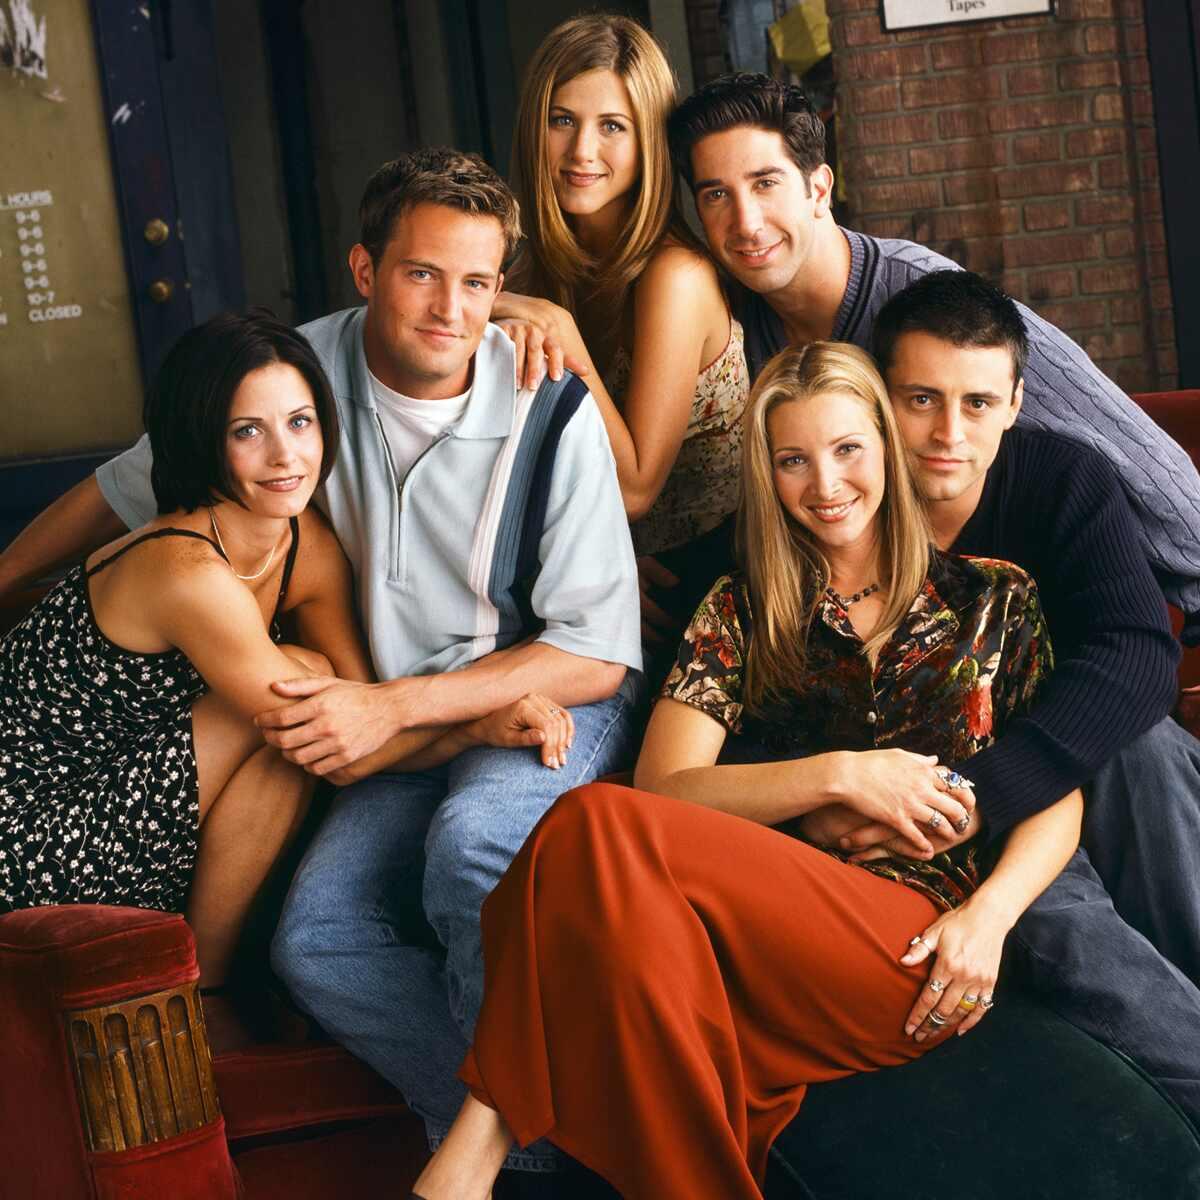 Friends, Cast, Jennifer Aniston, David Schwimmer, Courteney Cox, Lisa Kudrow, Matt LeBlanc, Matthew Perry